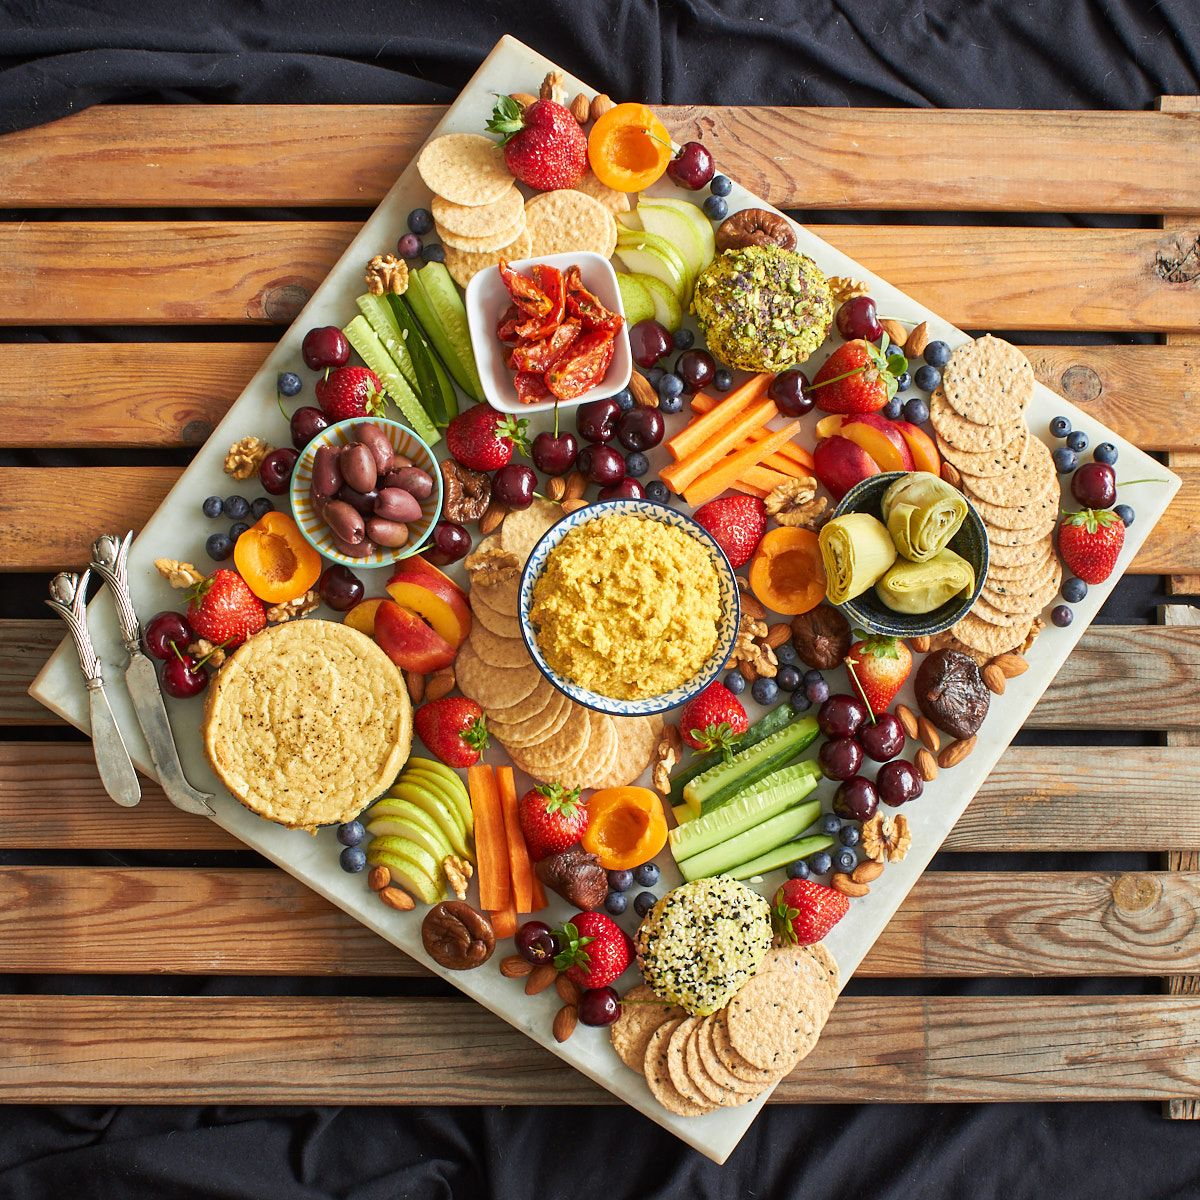 Vegan Keto Cauliflower Crust Pizza With Cashew Nut Cheese Recipe In 2020 Whole Food Recipes Whole 30 Vegan Vegan Keto Recipes